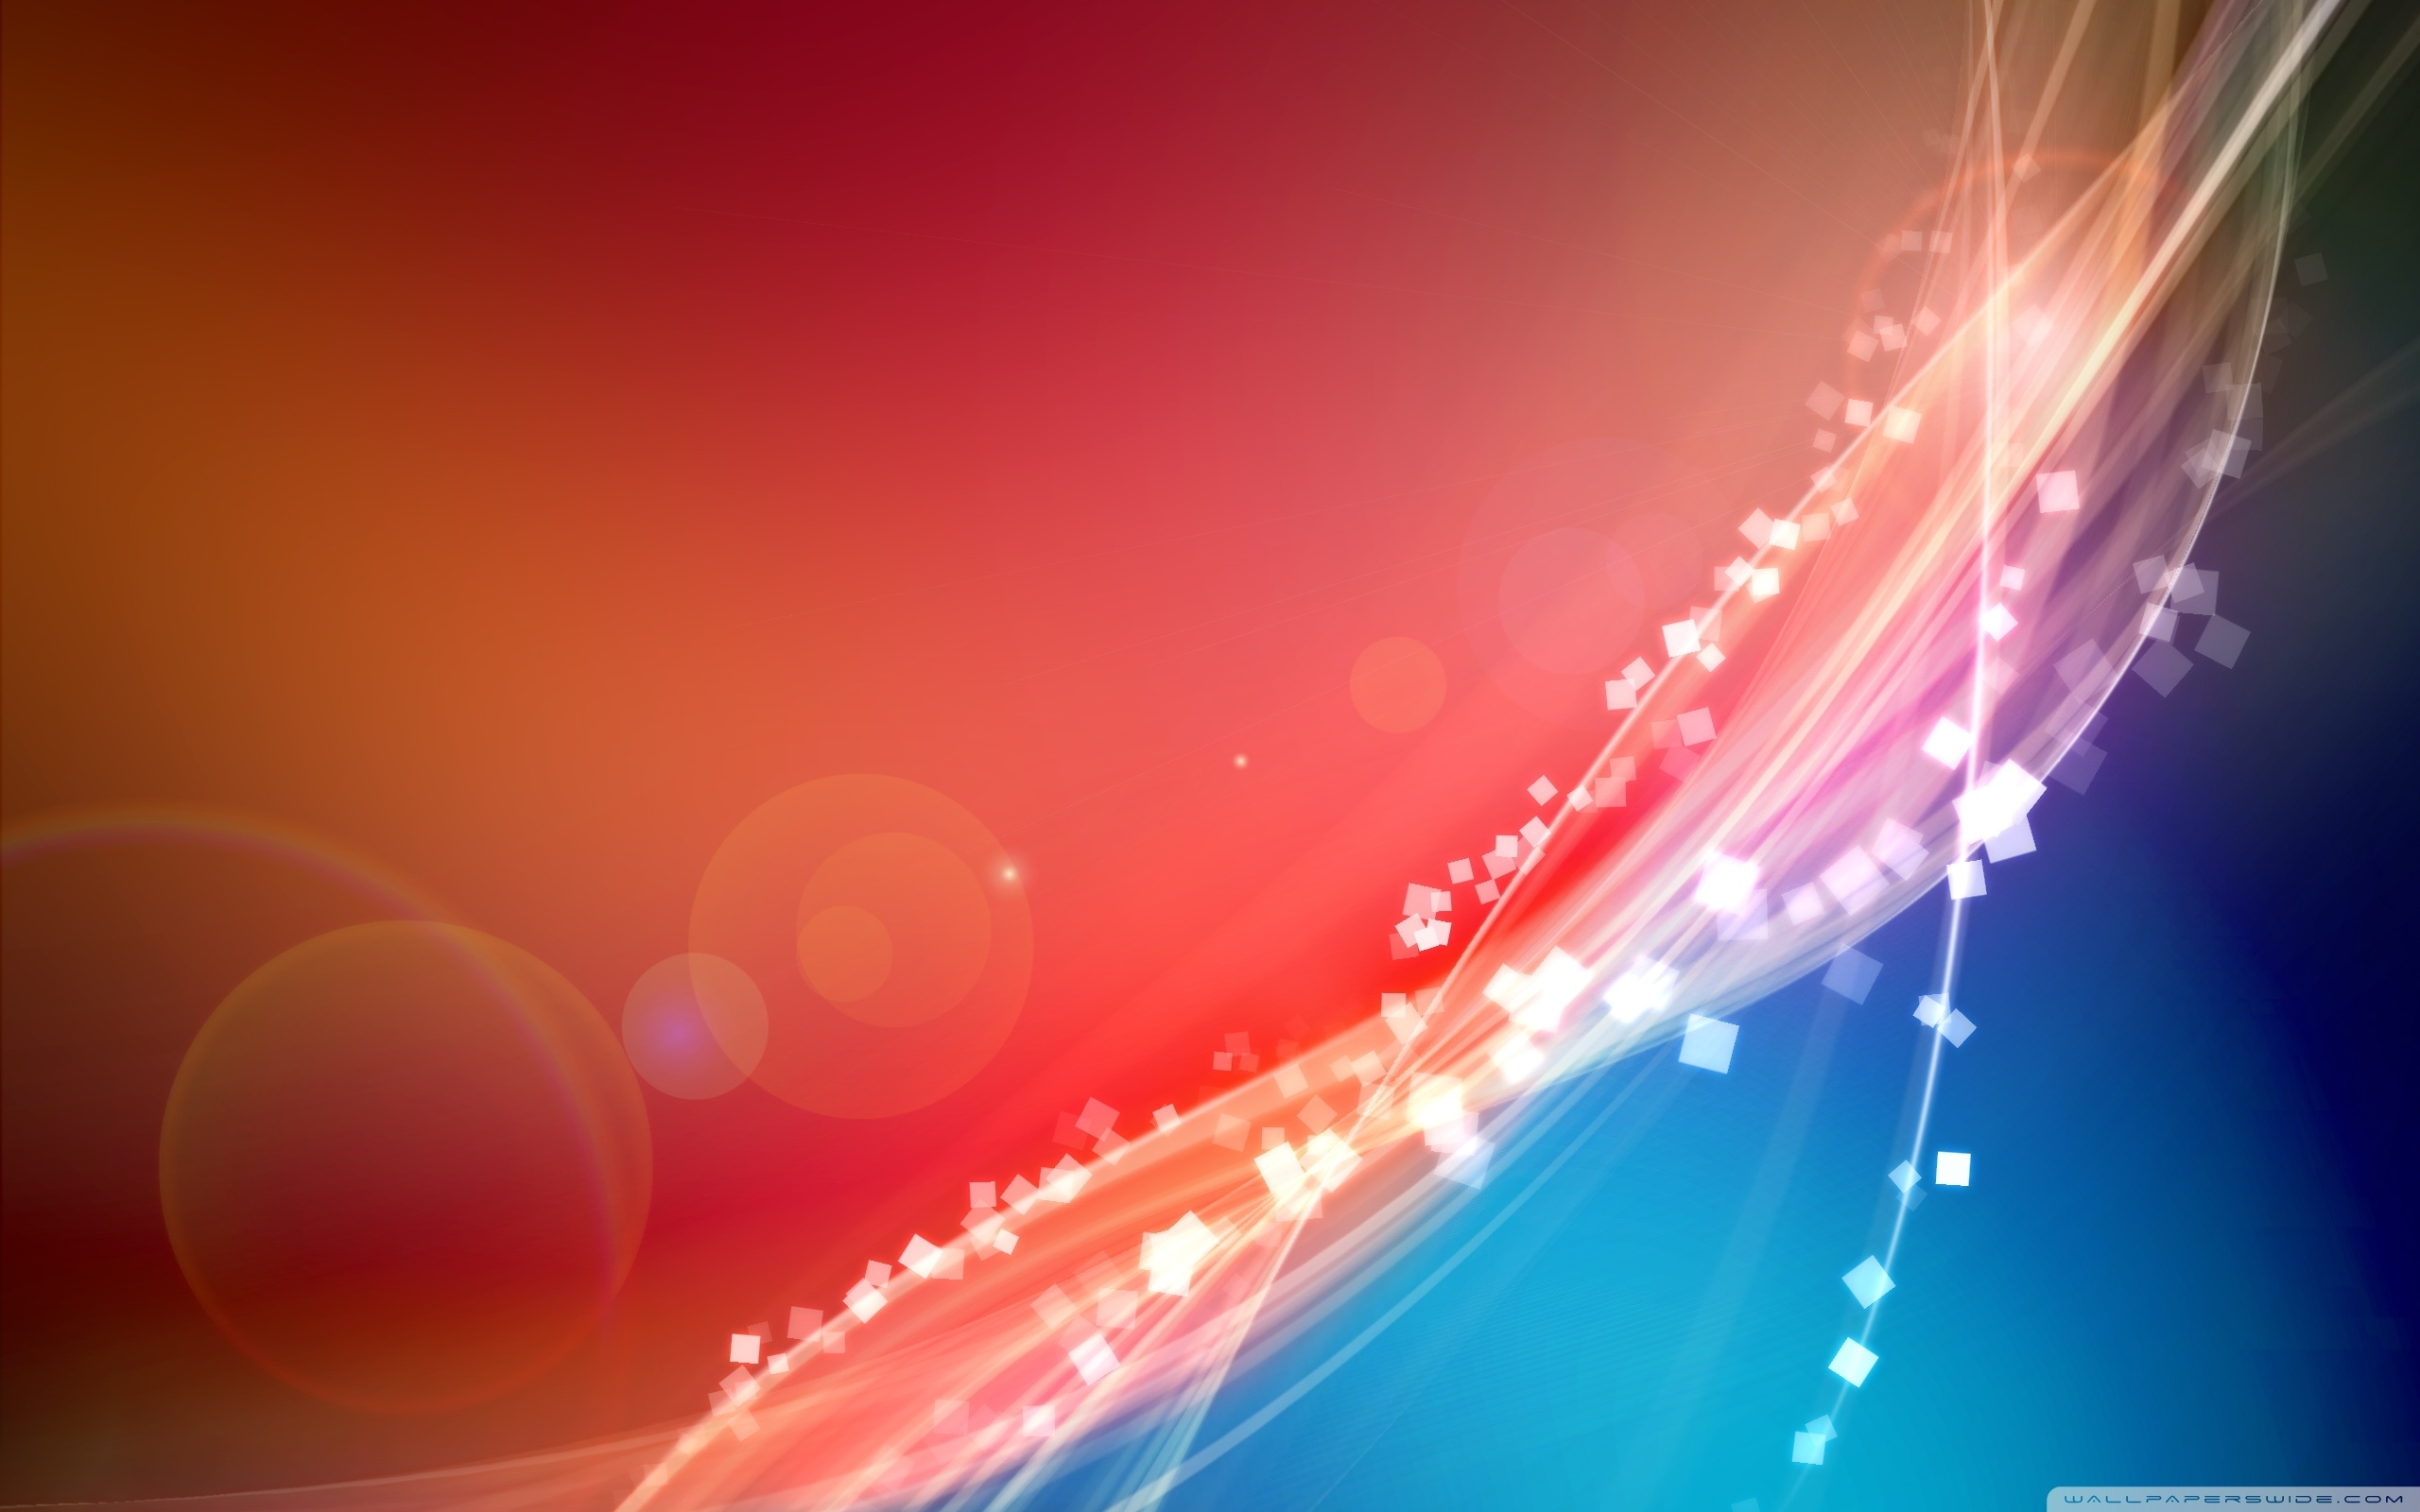 red and blue ❤ 4k hd desktop wallpaper for 4k ultra hd tv • wide